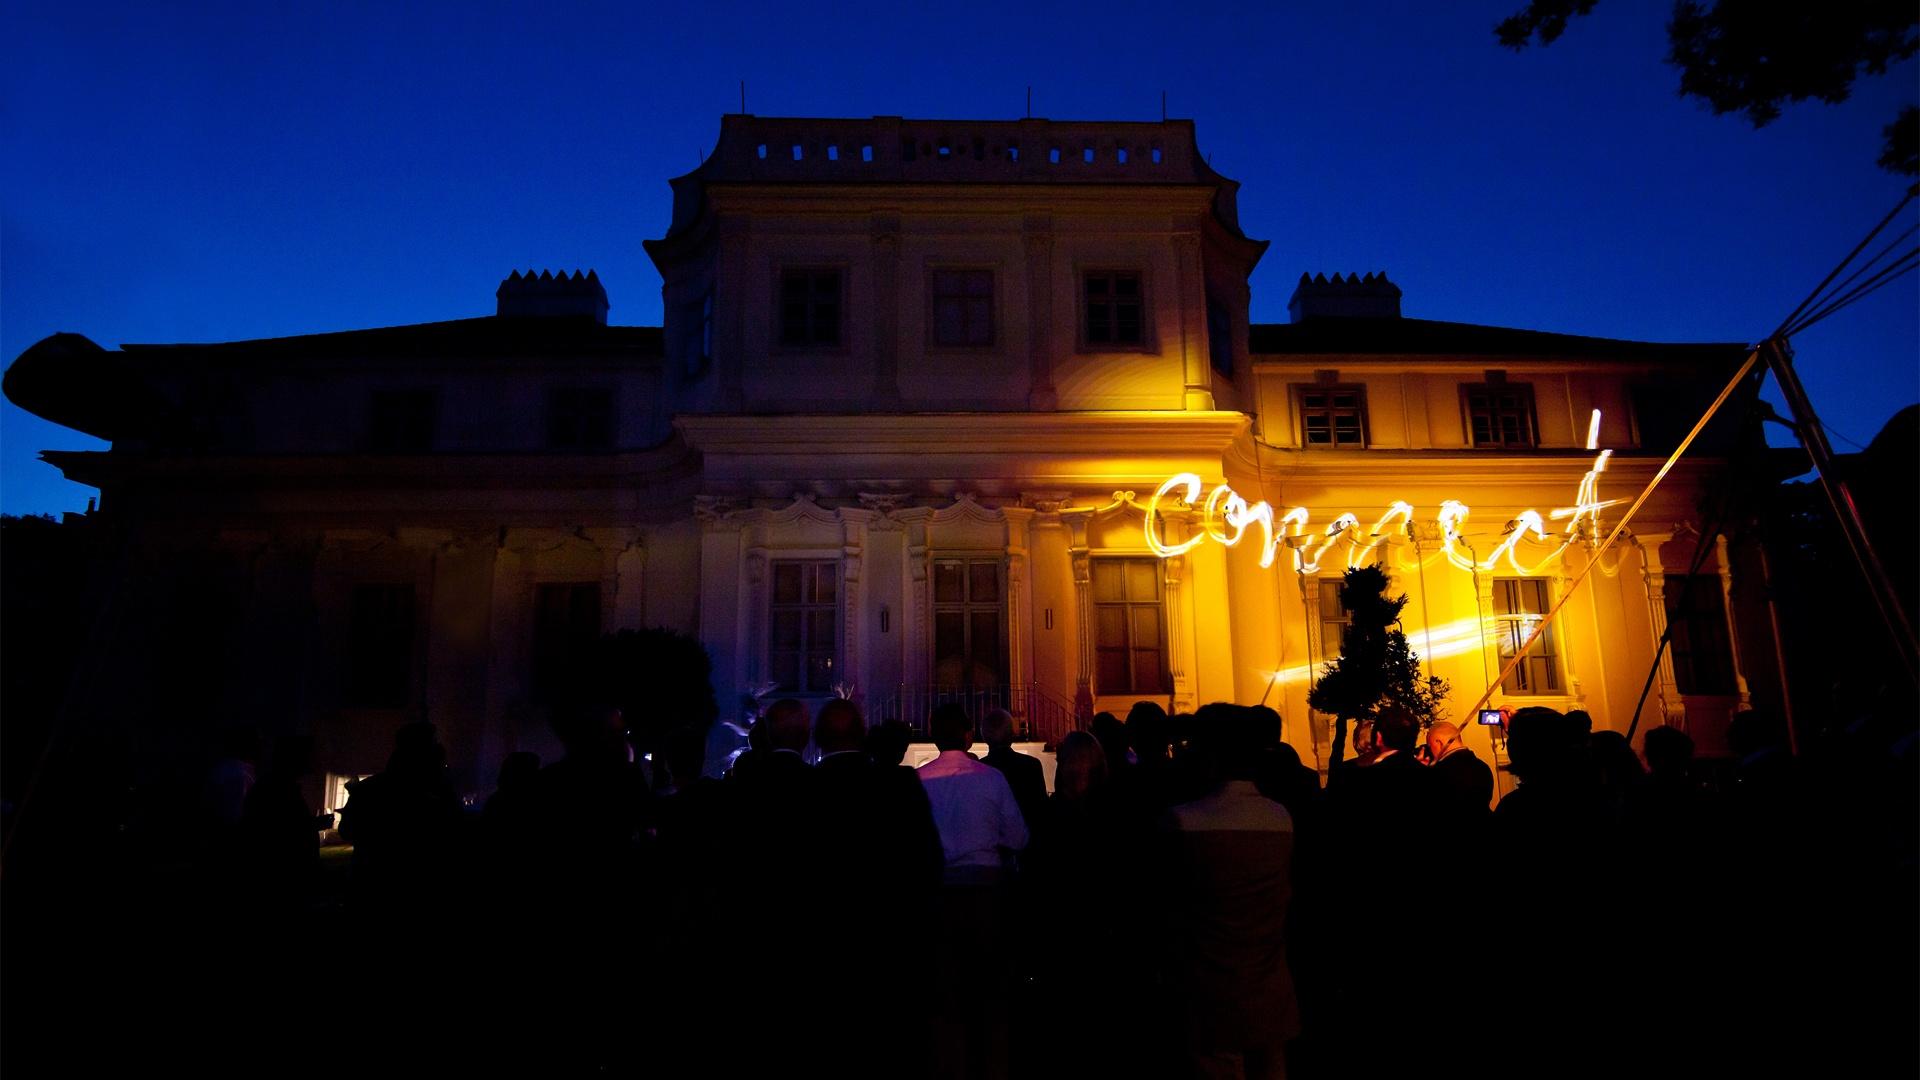 Siemens Directors' Club Wien Light Painting